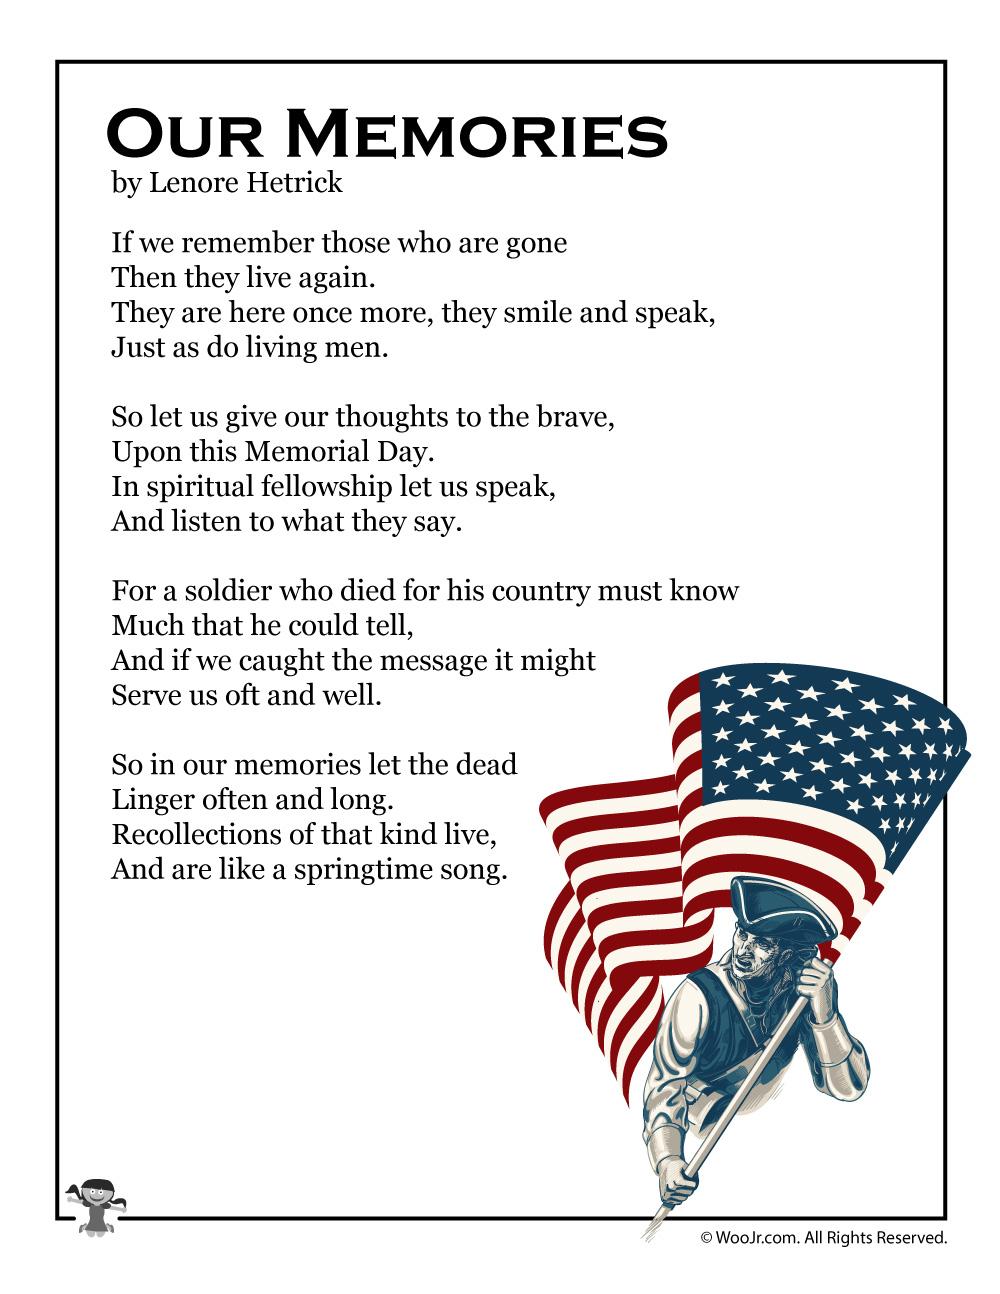 Our Memories Poem Memorial Day Photo